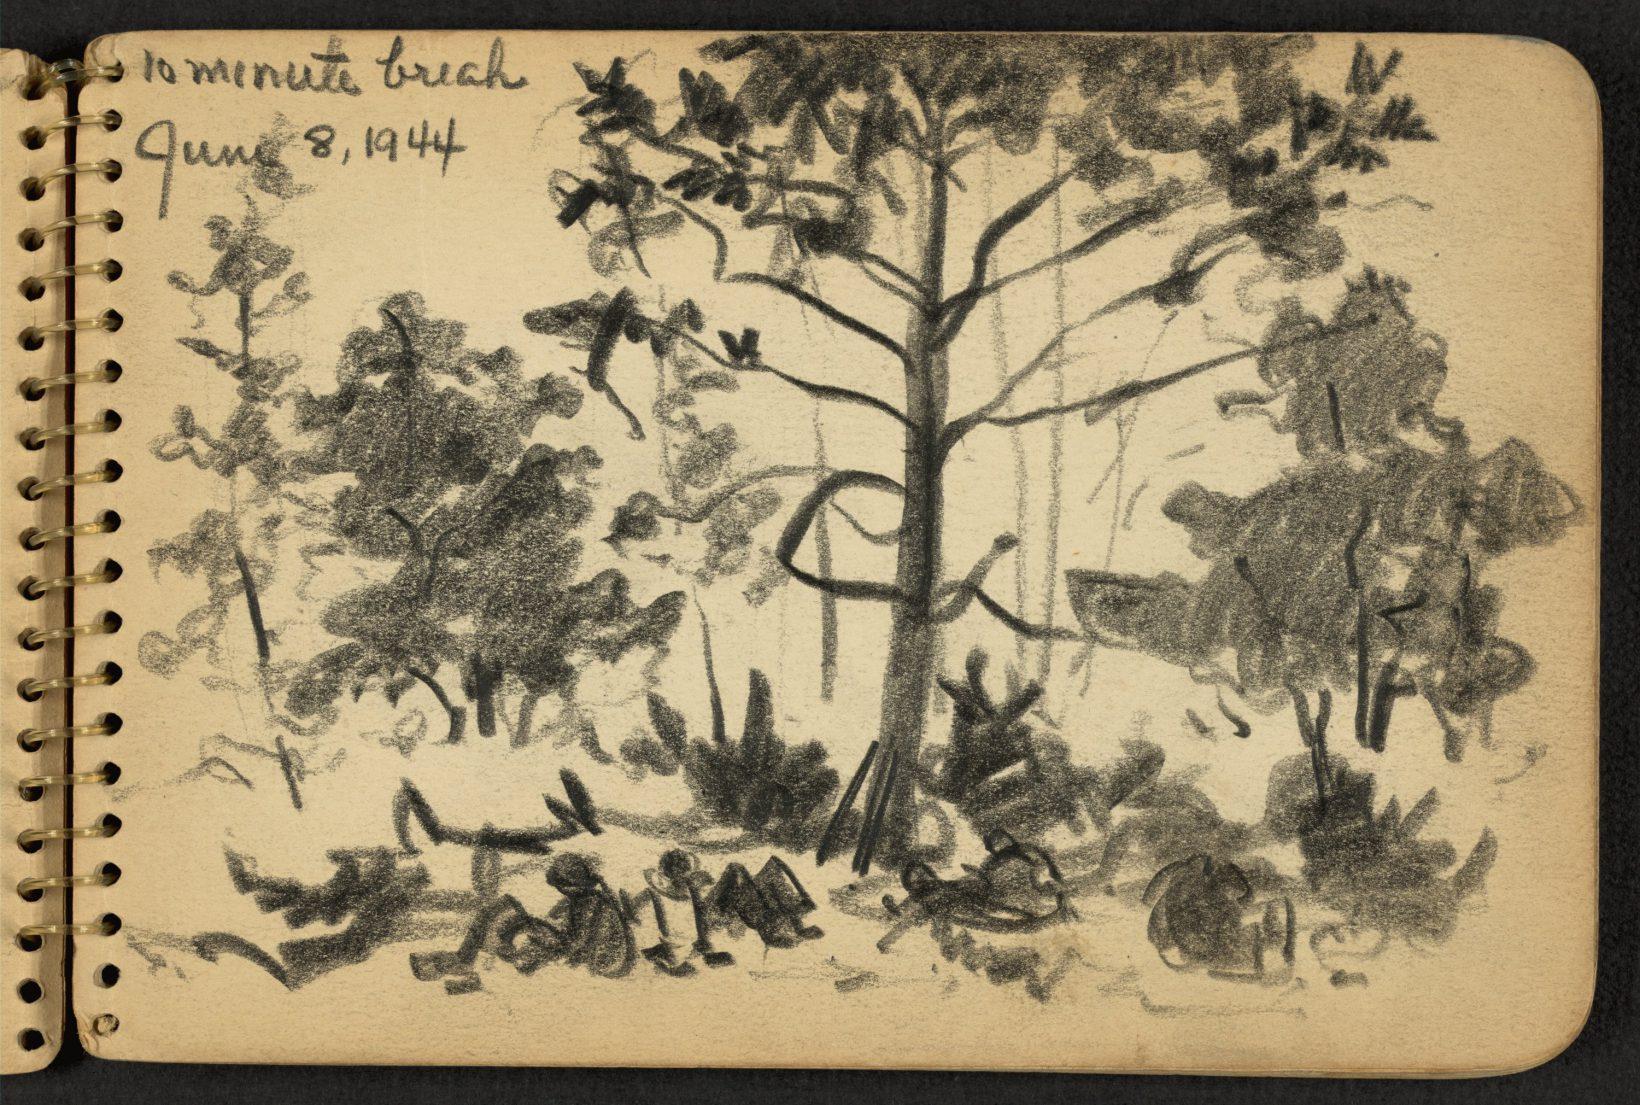 victor-lundy-carnet-croquis-seconde-guerre-mondiale-19